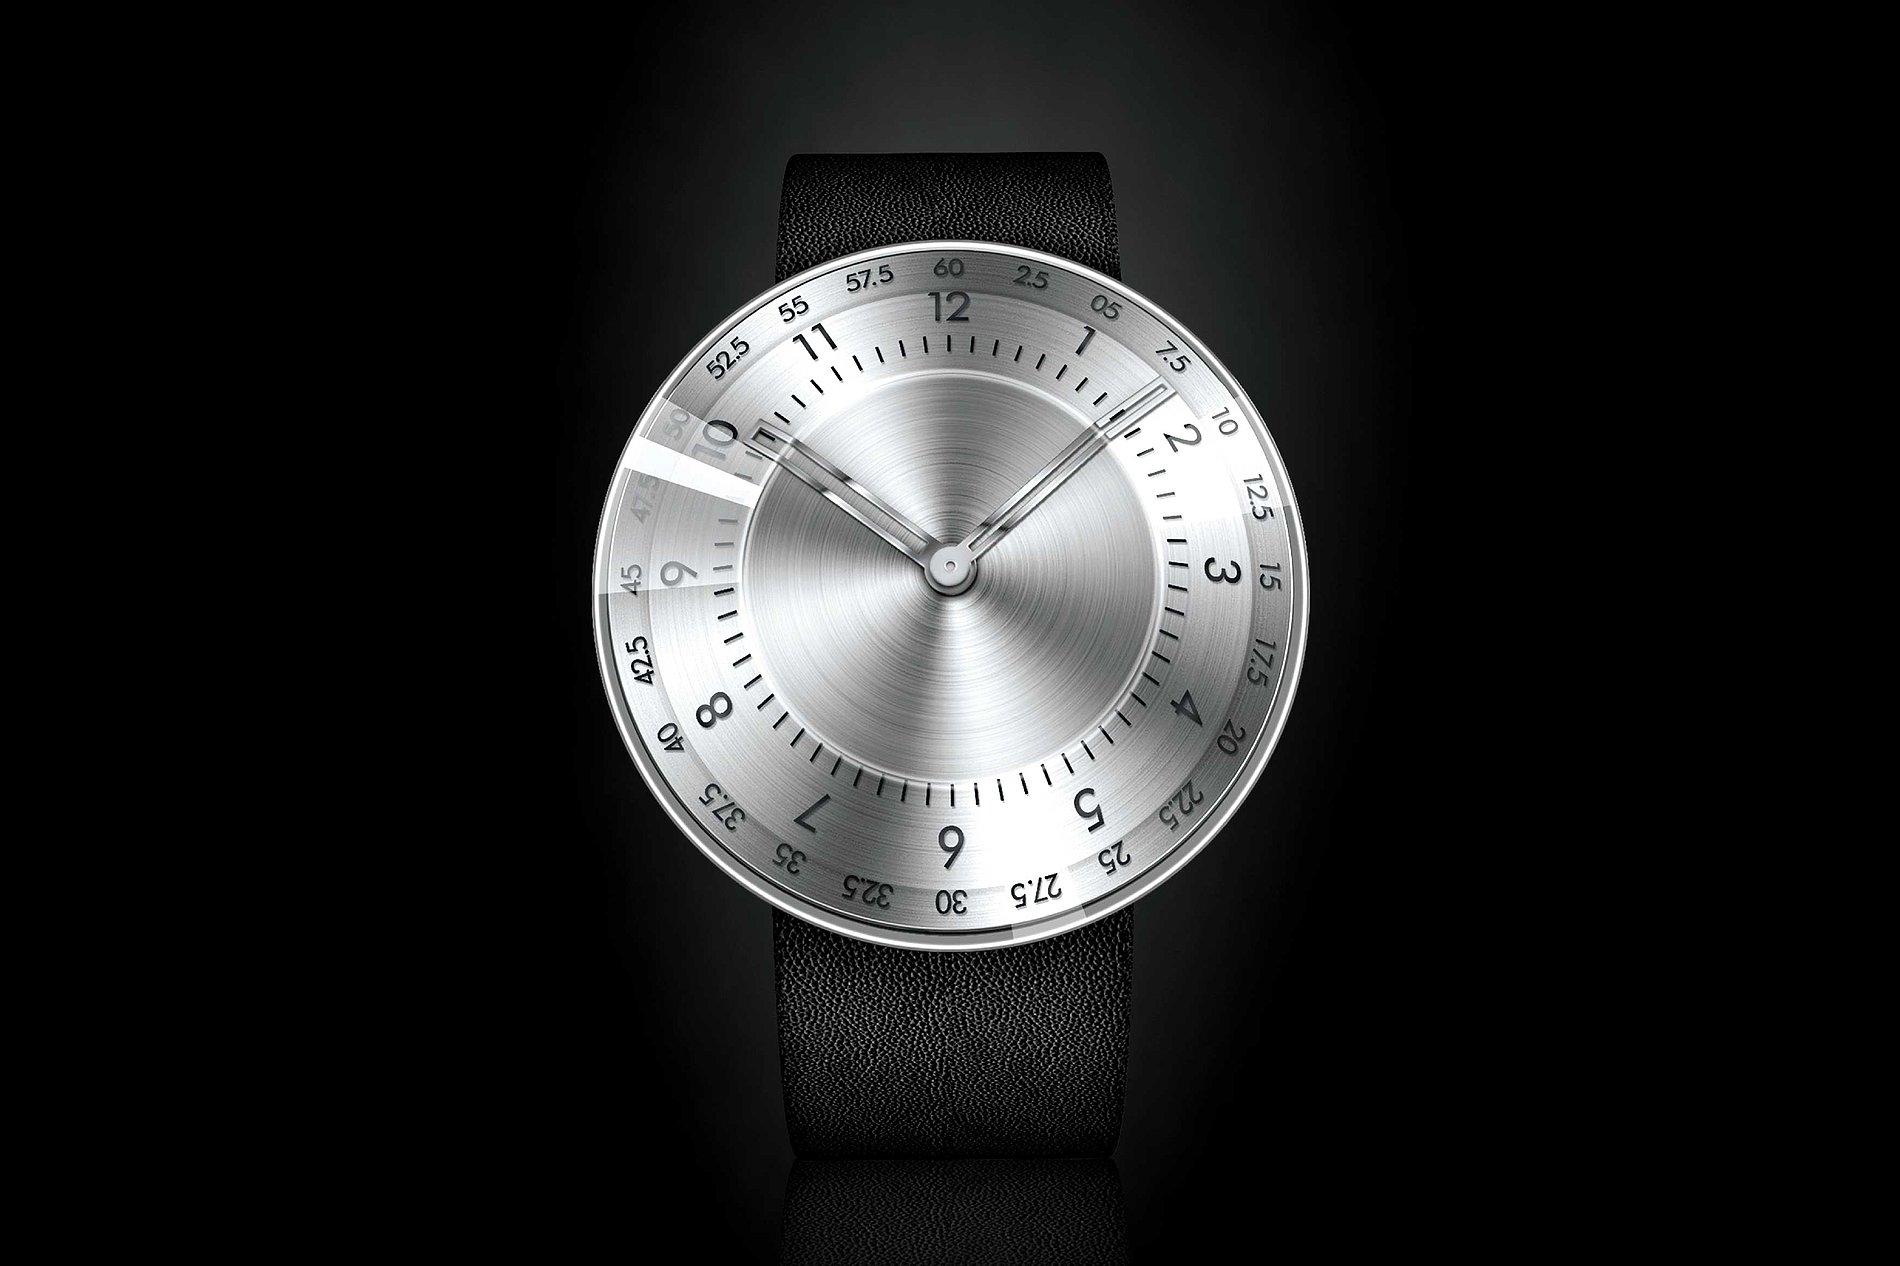 Innovative 3D Crystal Watch | Red Dot Design Award